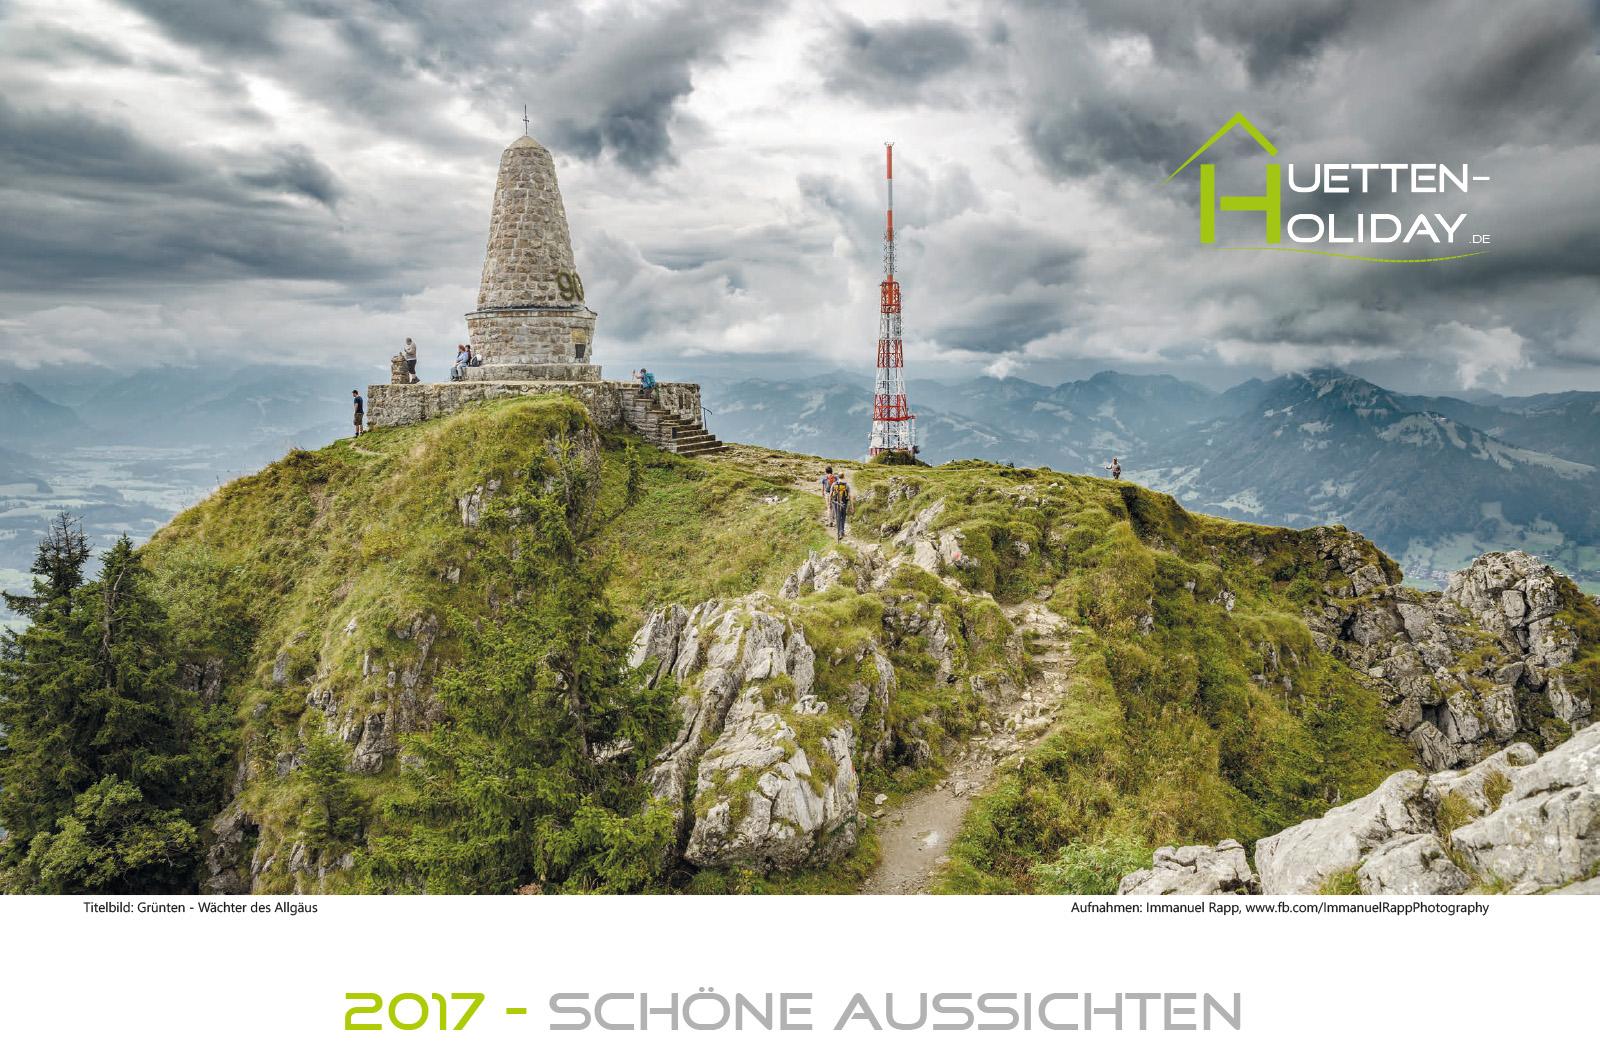 2016 Huettenholiday Wandkalender 2017 A3 quer.indd